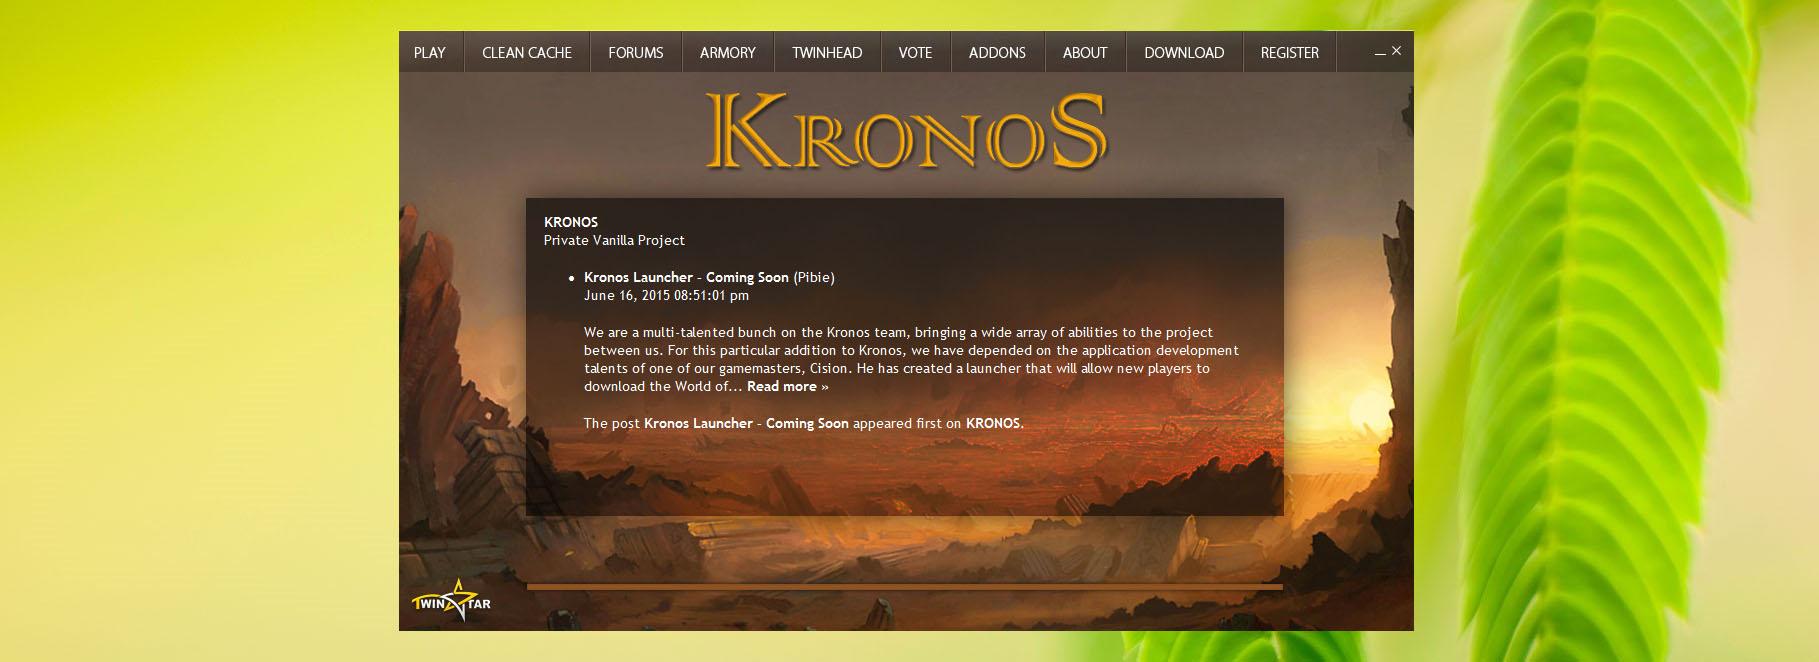 KRONOS • Kronos Status Update